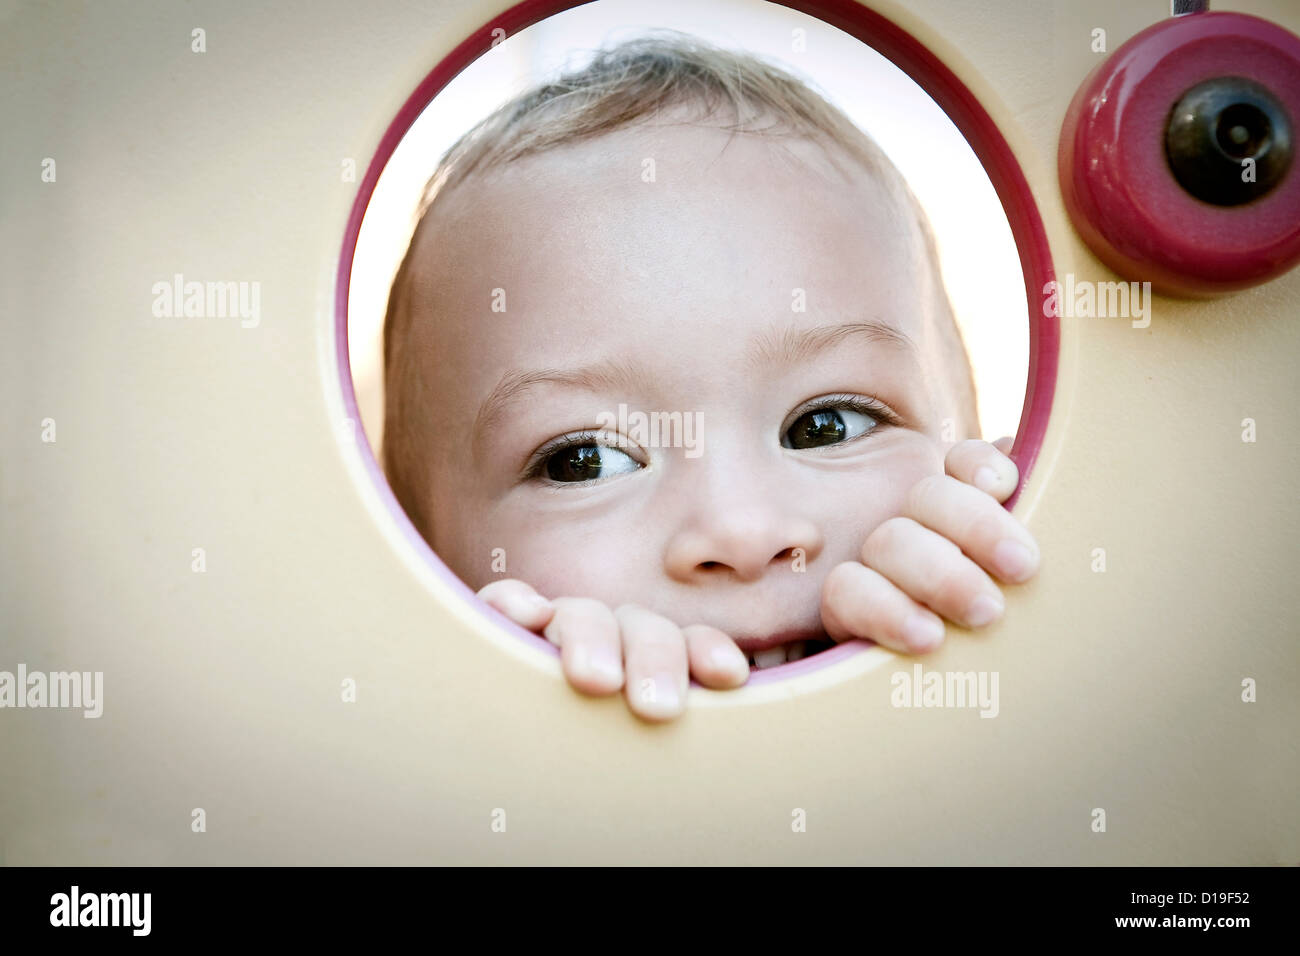 Girl peeking through circle Photo Stock